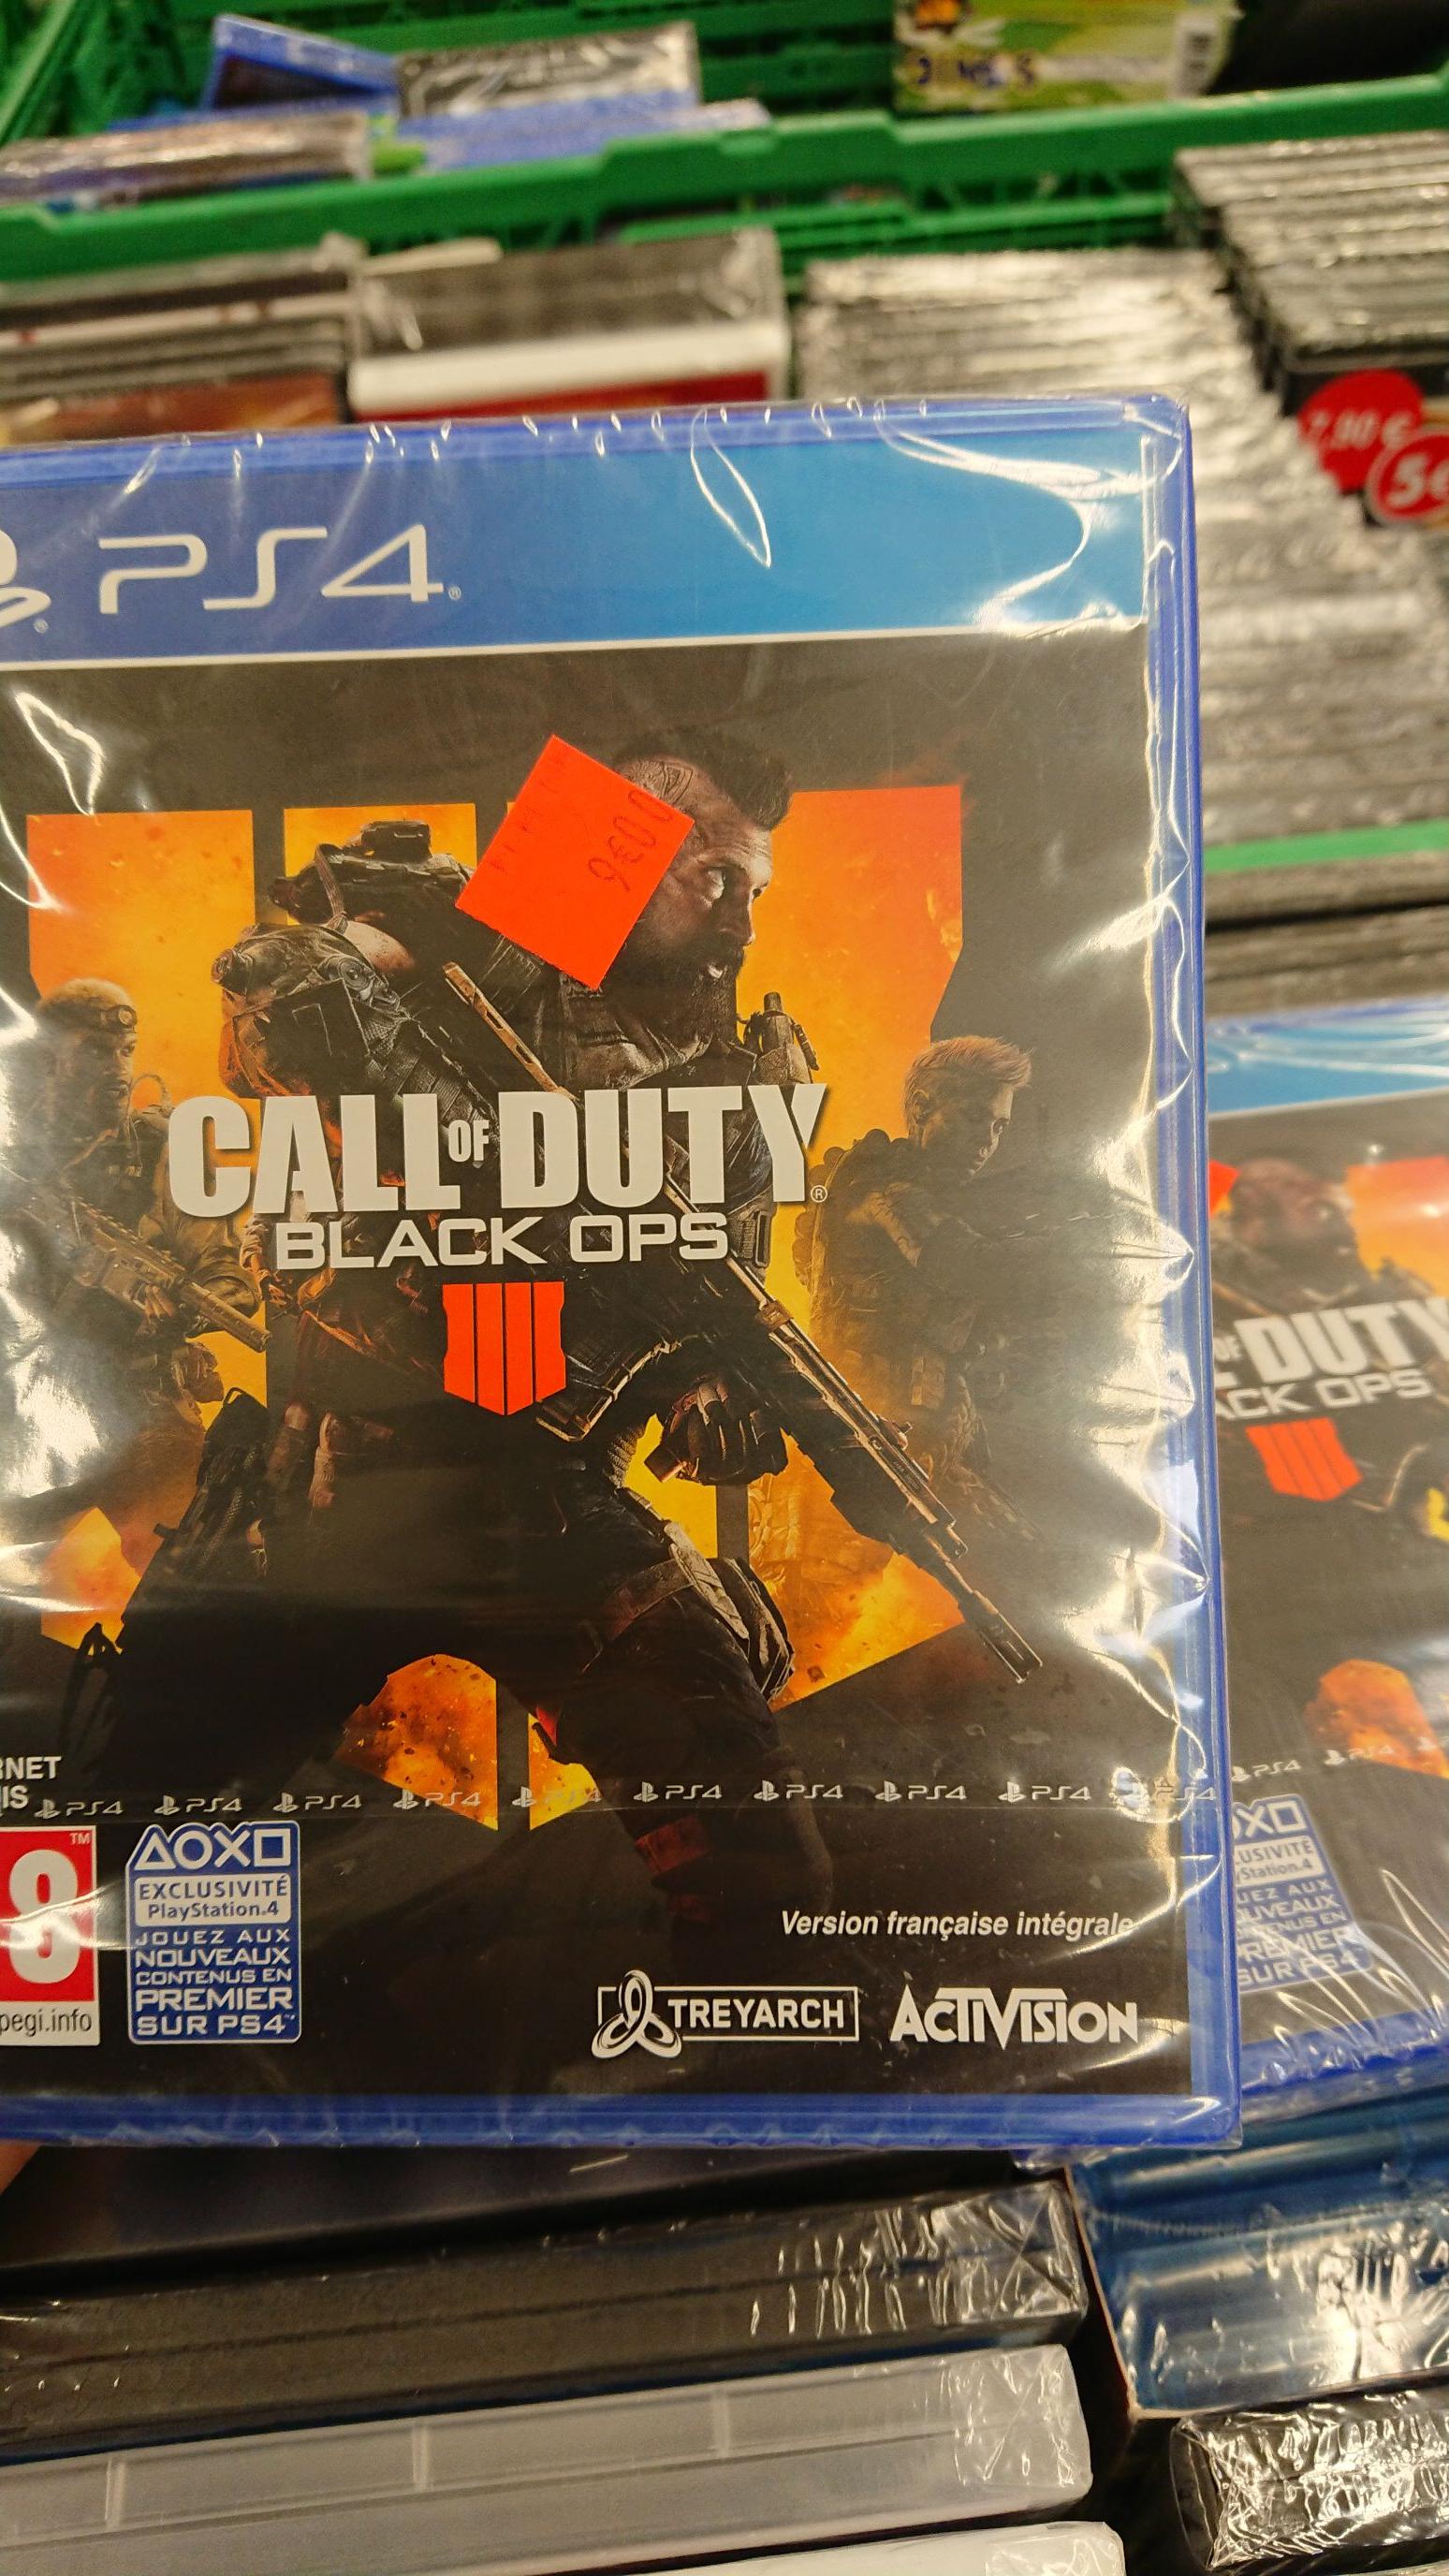 Jeu Call of Duty Black ops 4 sur PS4, PC ou Xbox One - Carrefour Flins (78)